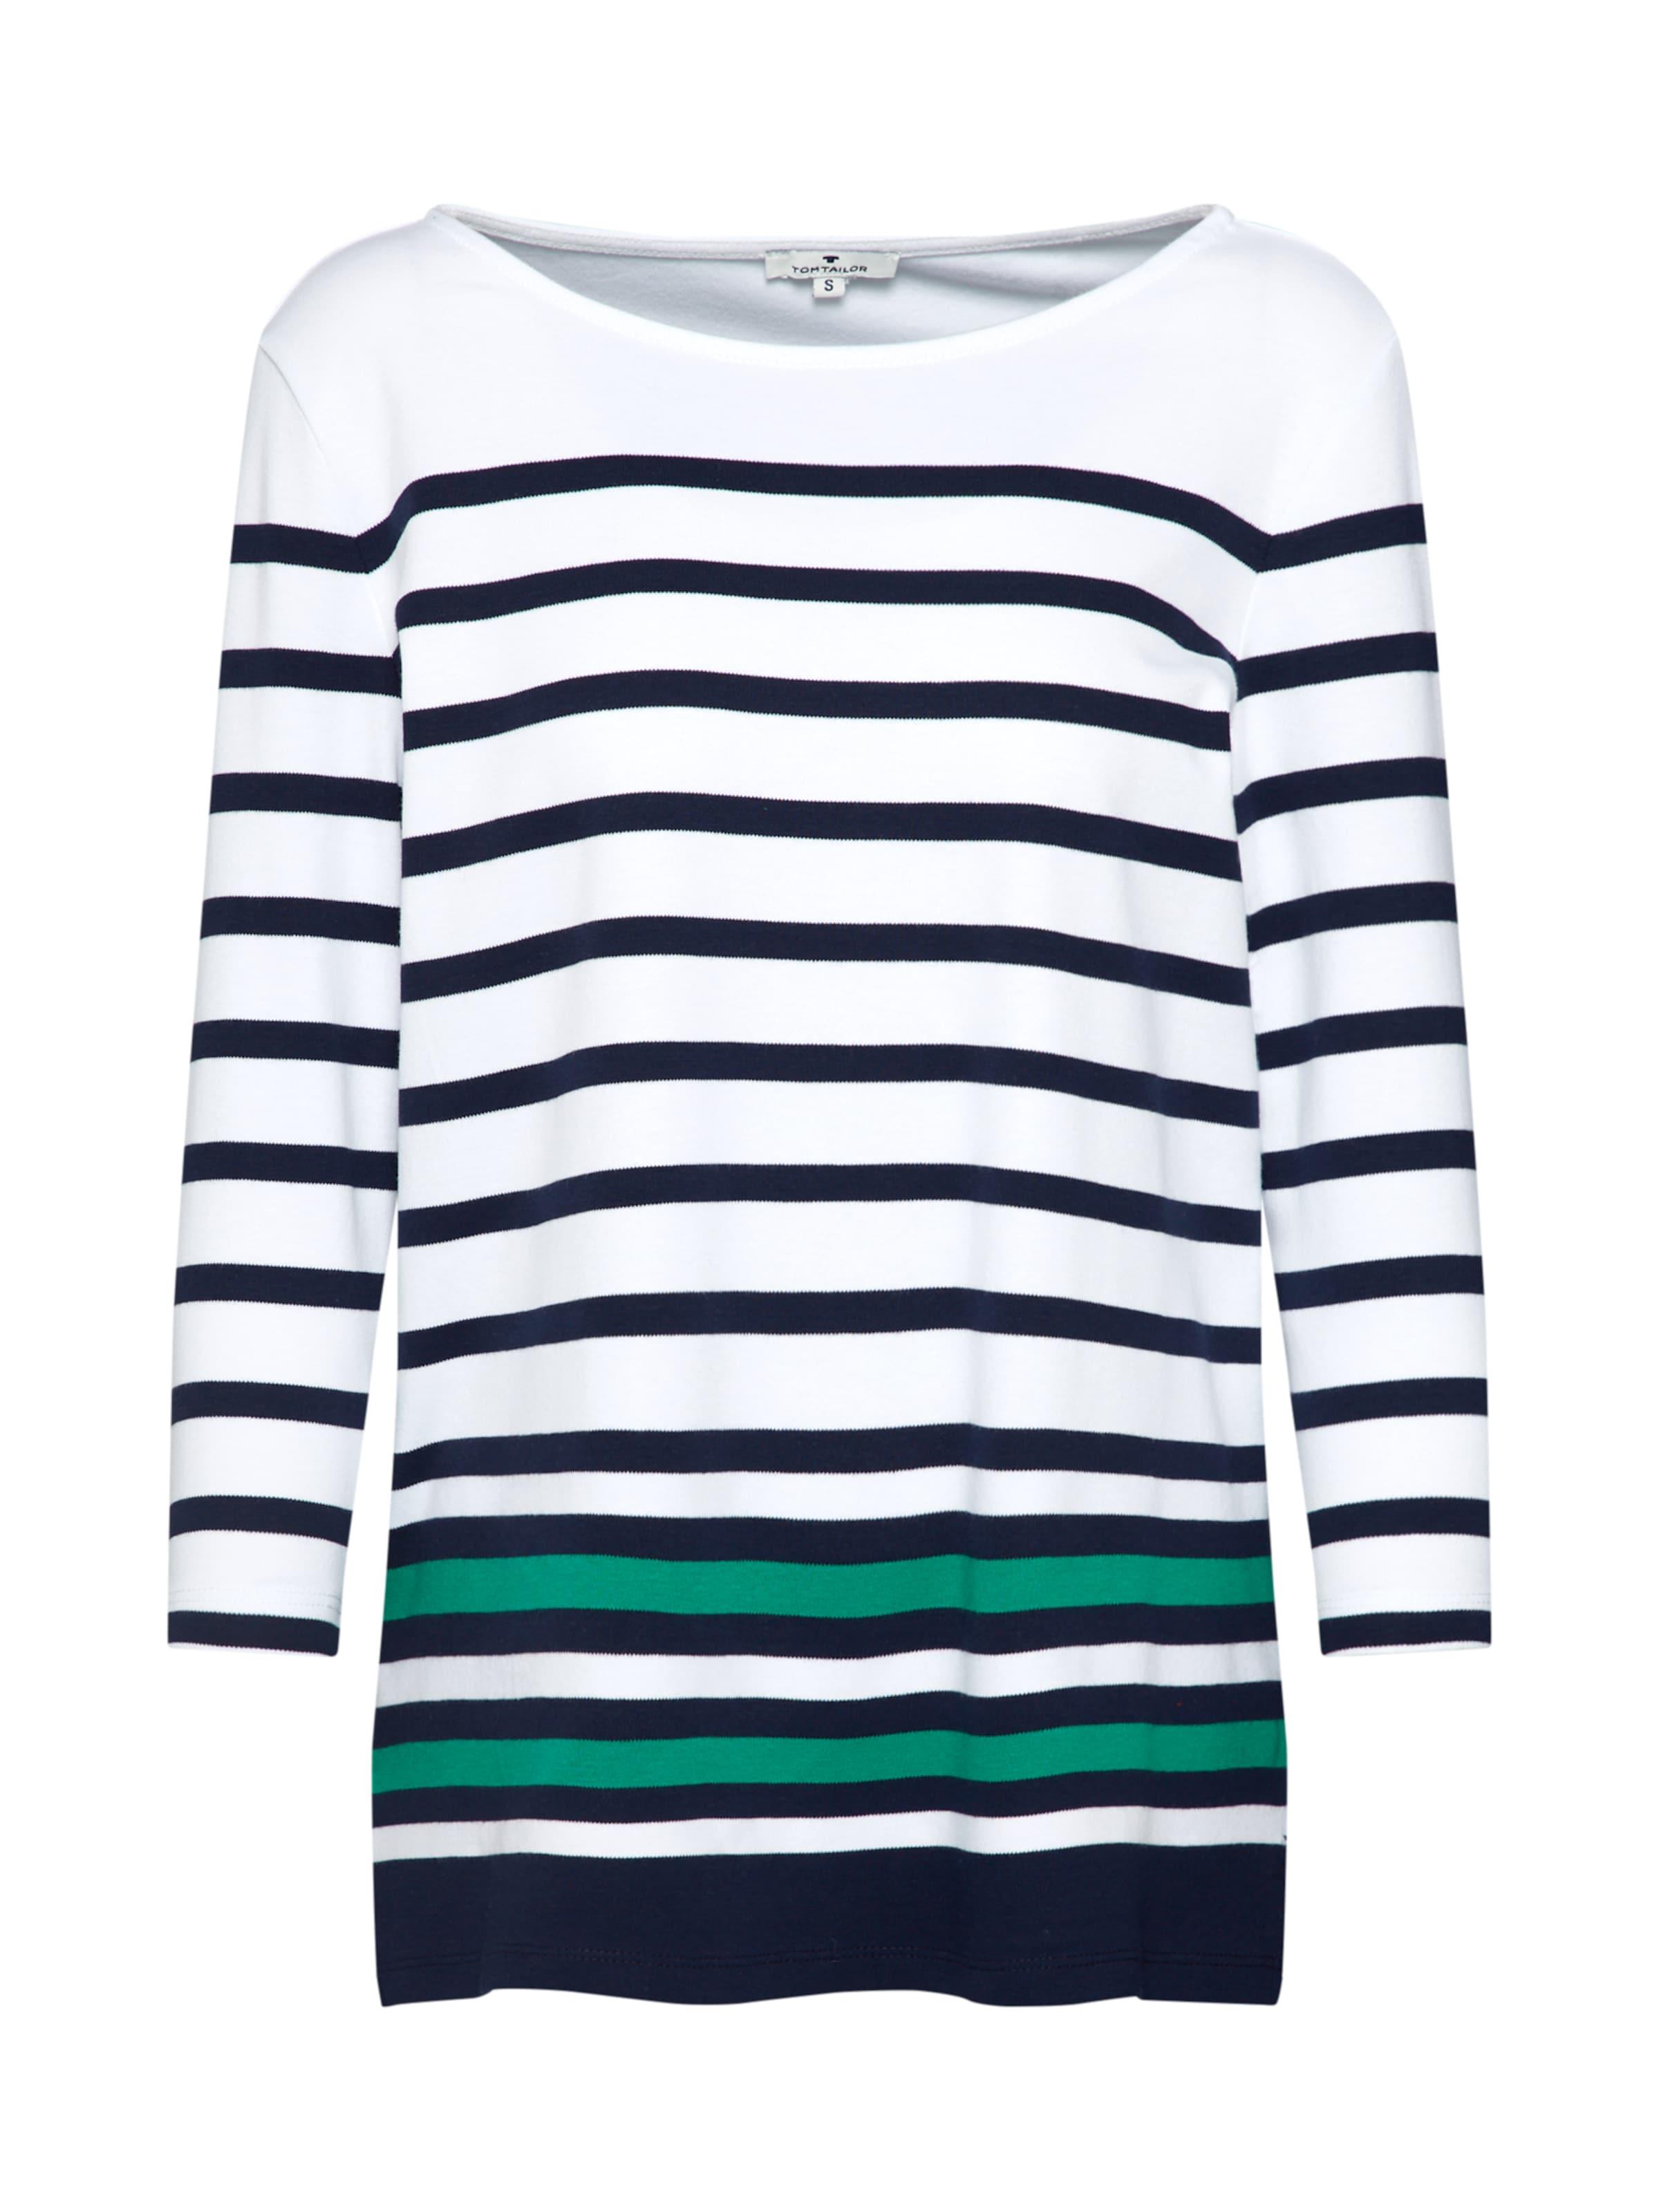 Blanc Tom NuitVert Tailor Bleu shirt En T zMqpSUV